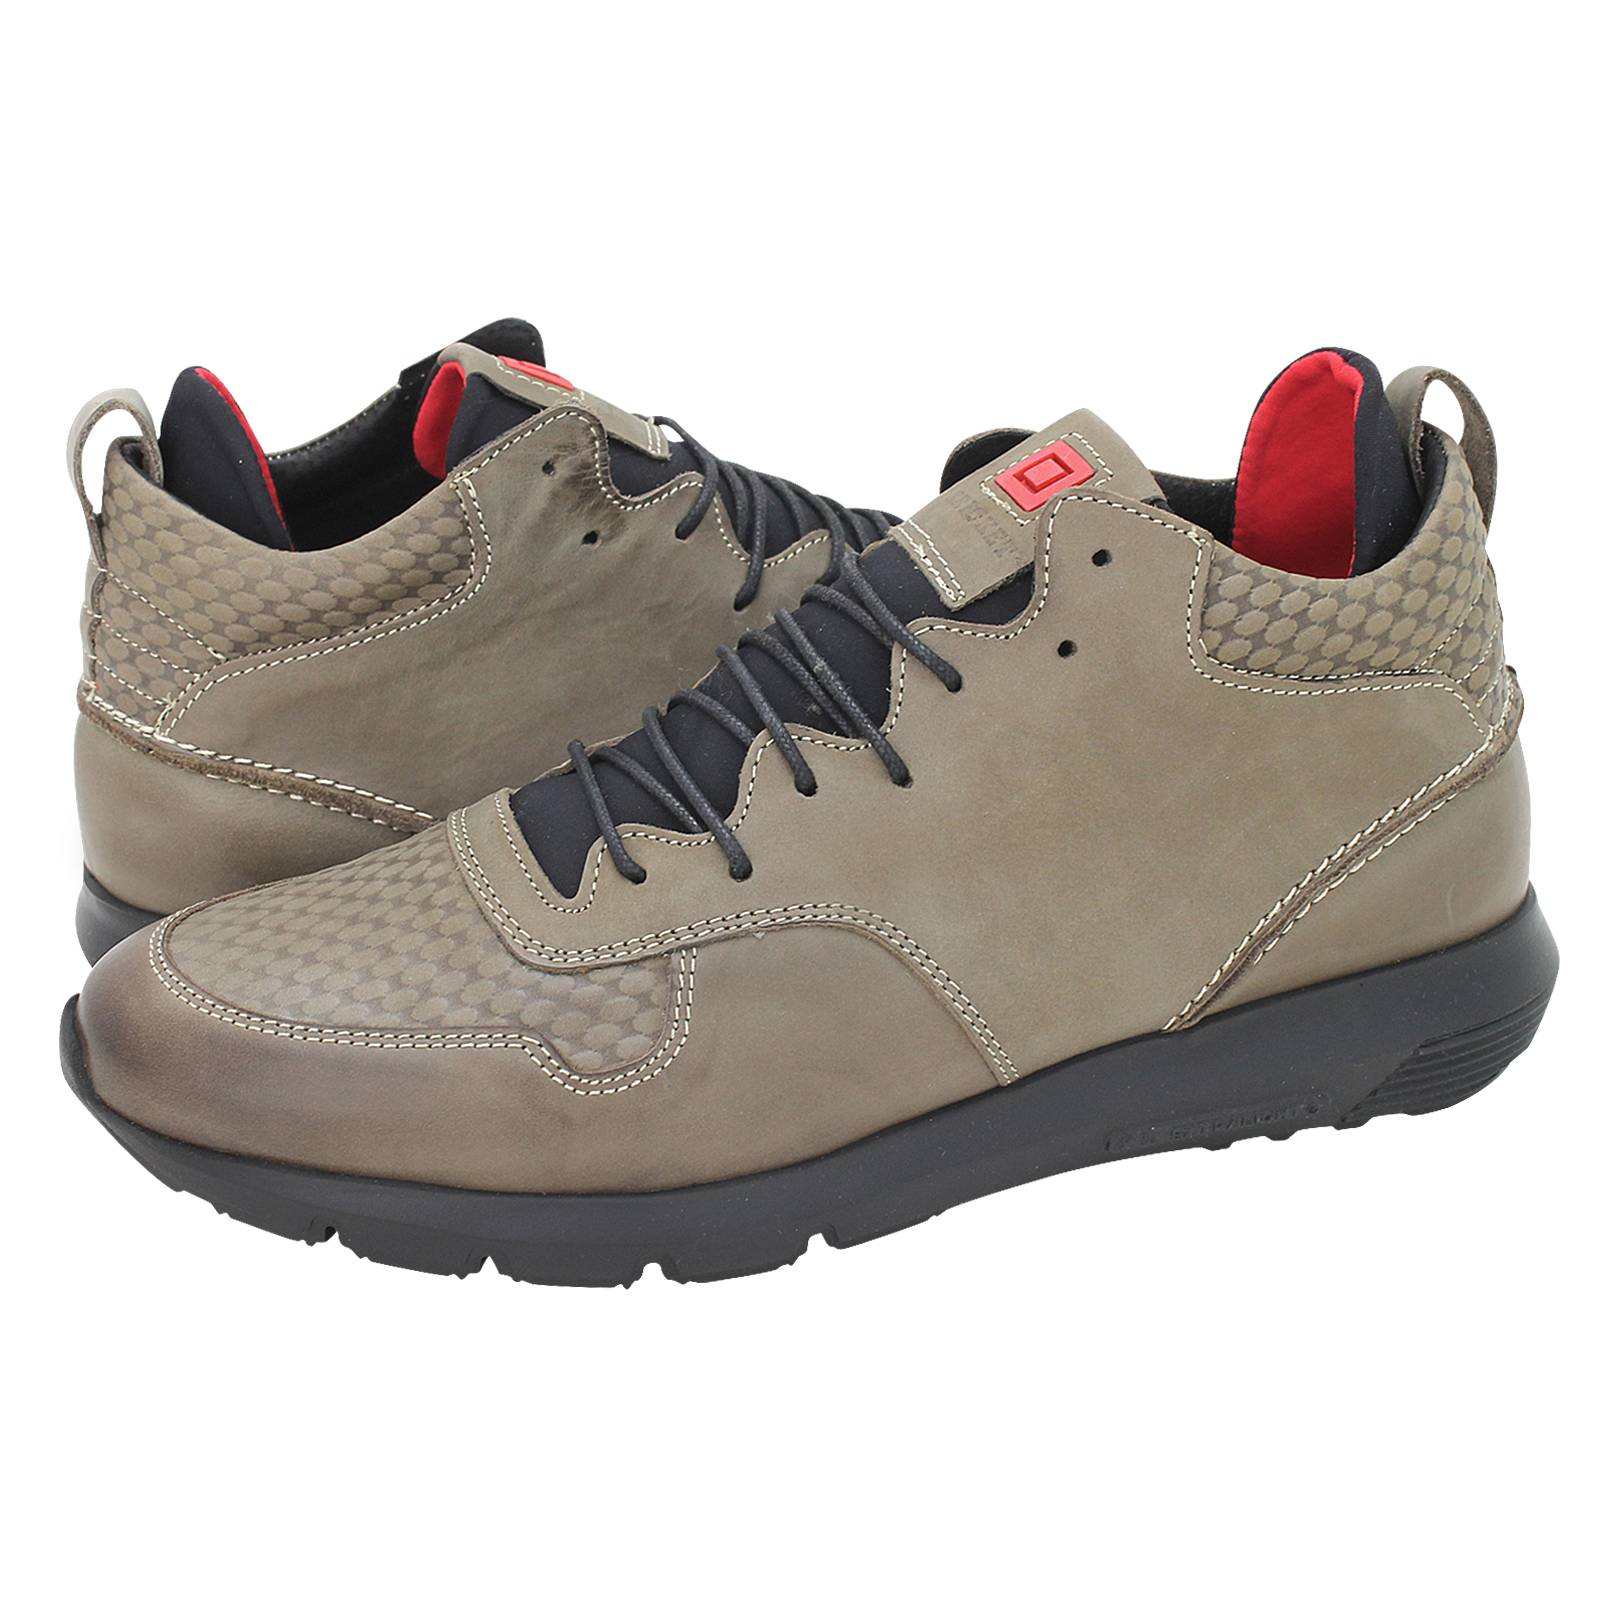 6911ac1350 Snap 2 - Ανδρικά παπούτσια casual Kricket από δέρμα - Gianna Kazakou ...